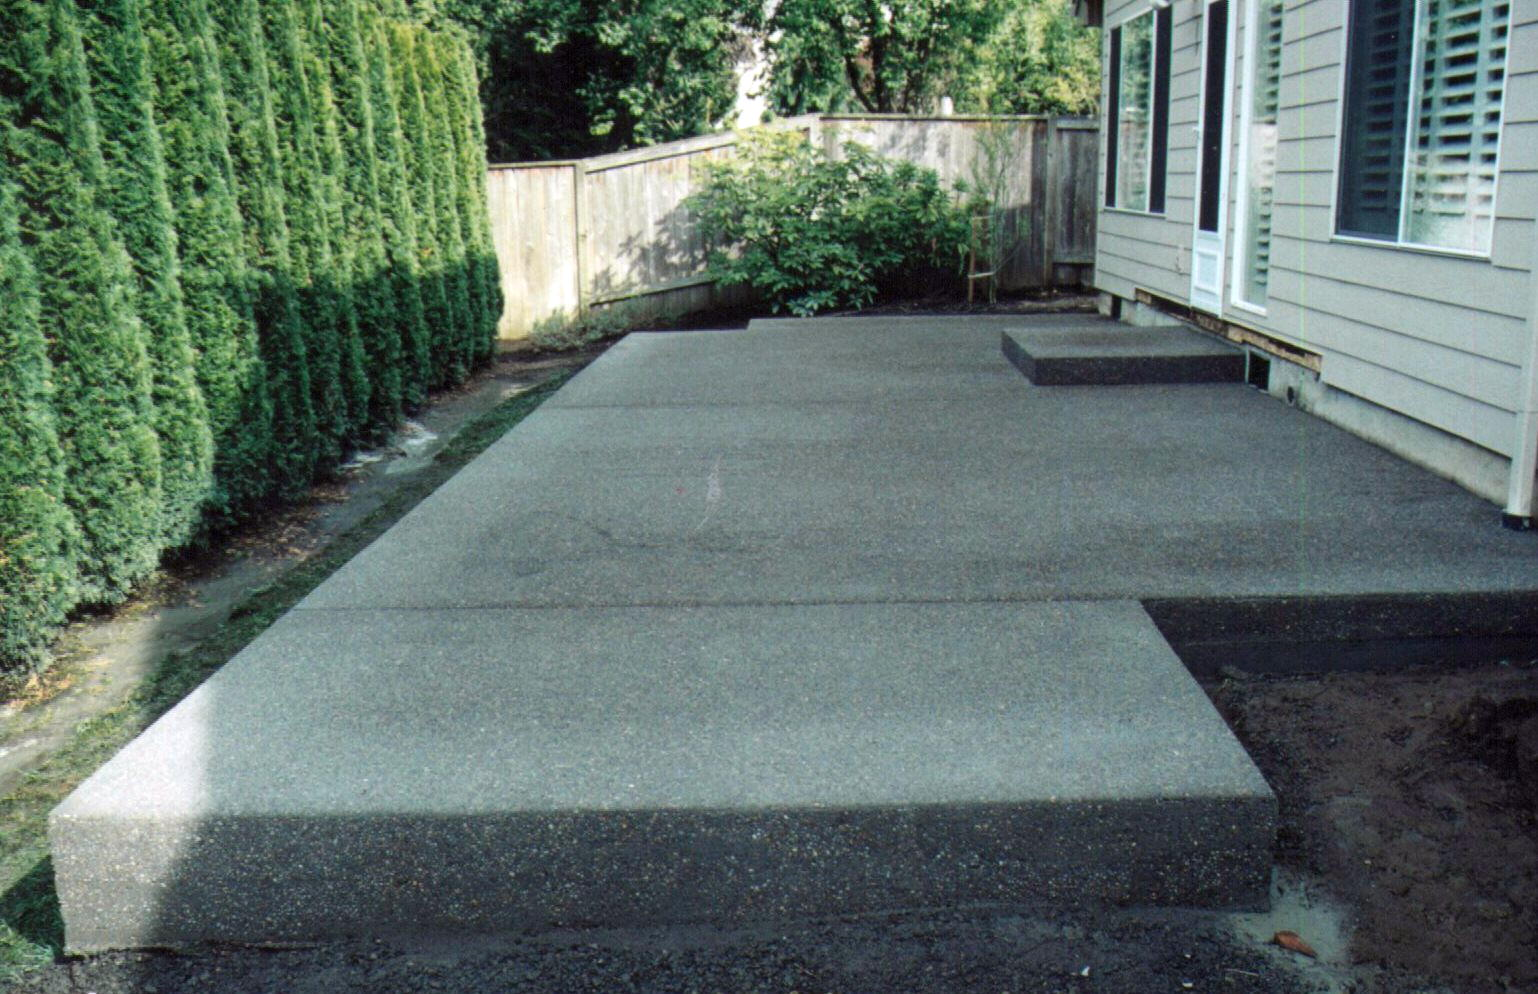 stunning concrete patio design ideas gallery - mericamedia